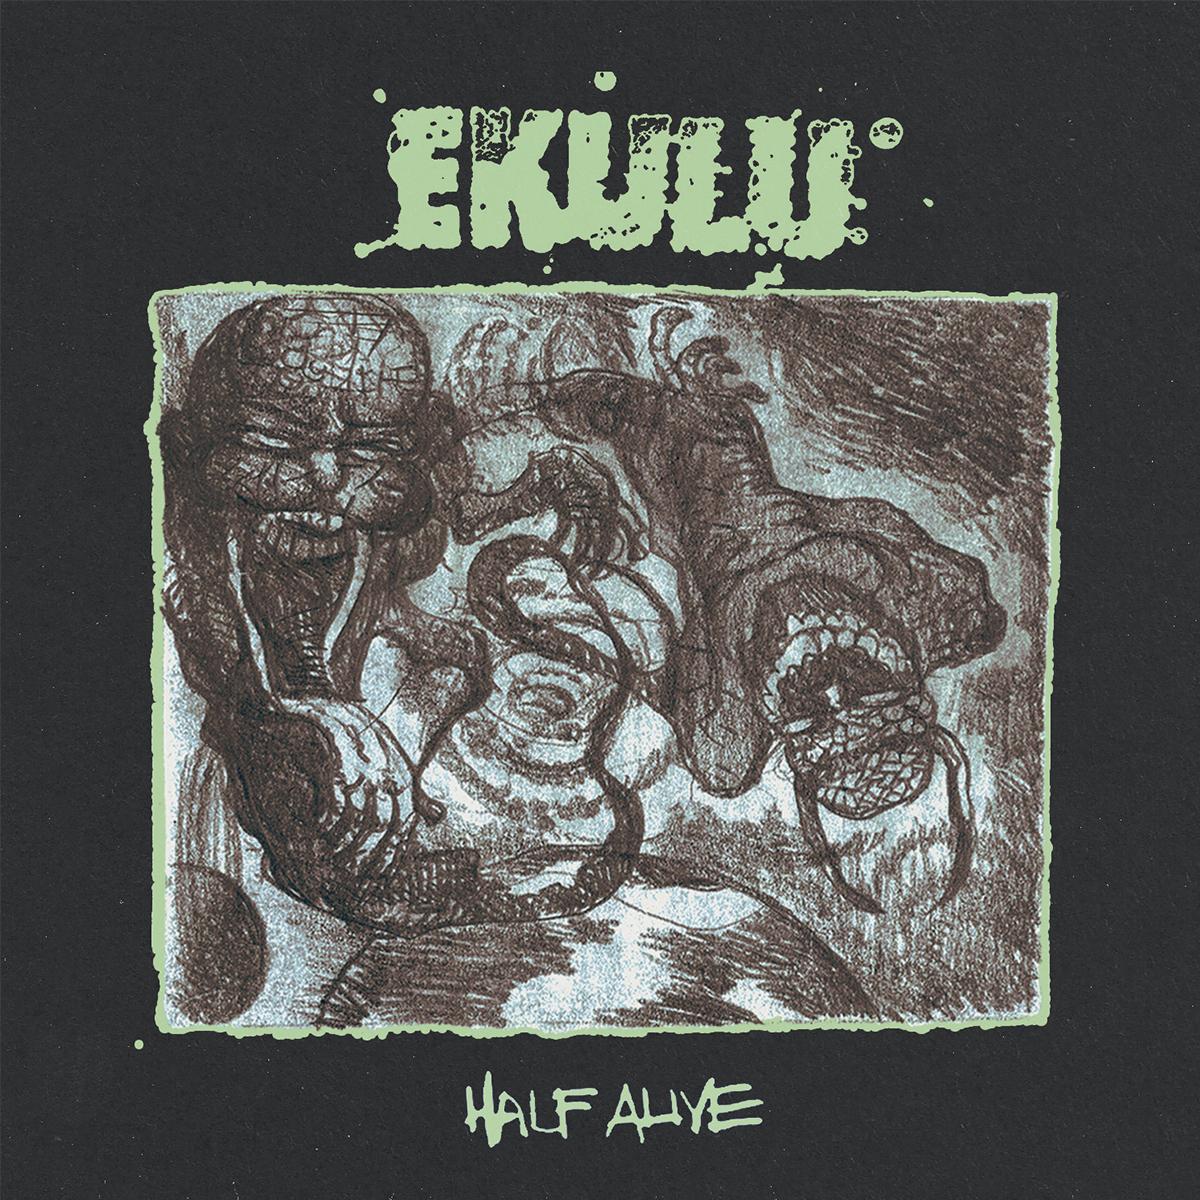 Triple B Records - EKULU - Half Alive 7